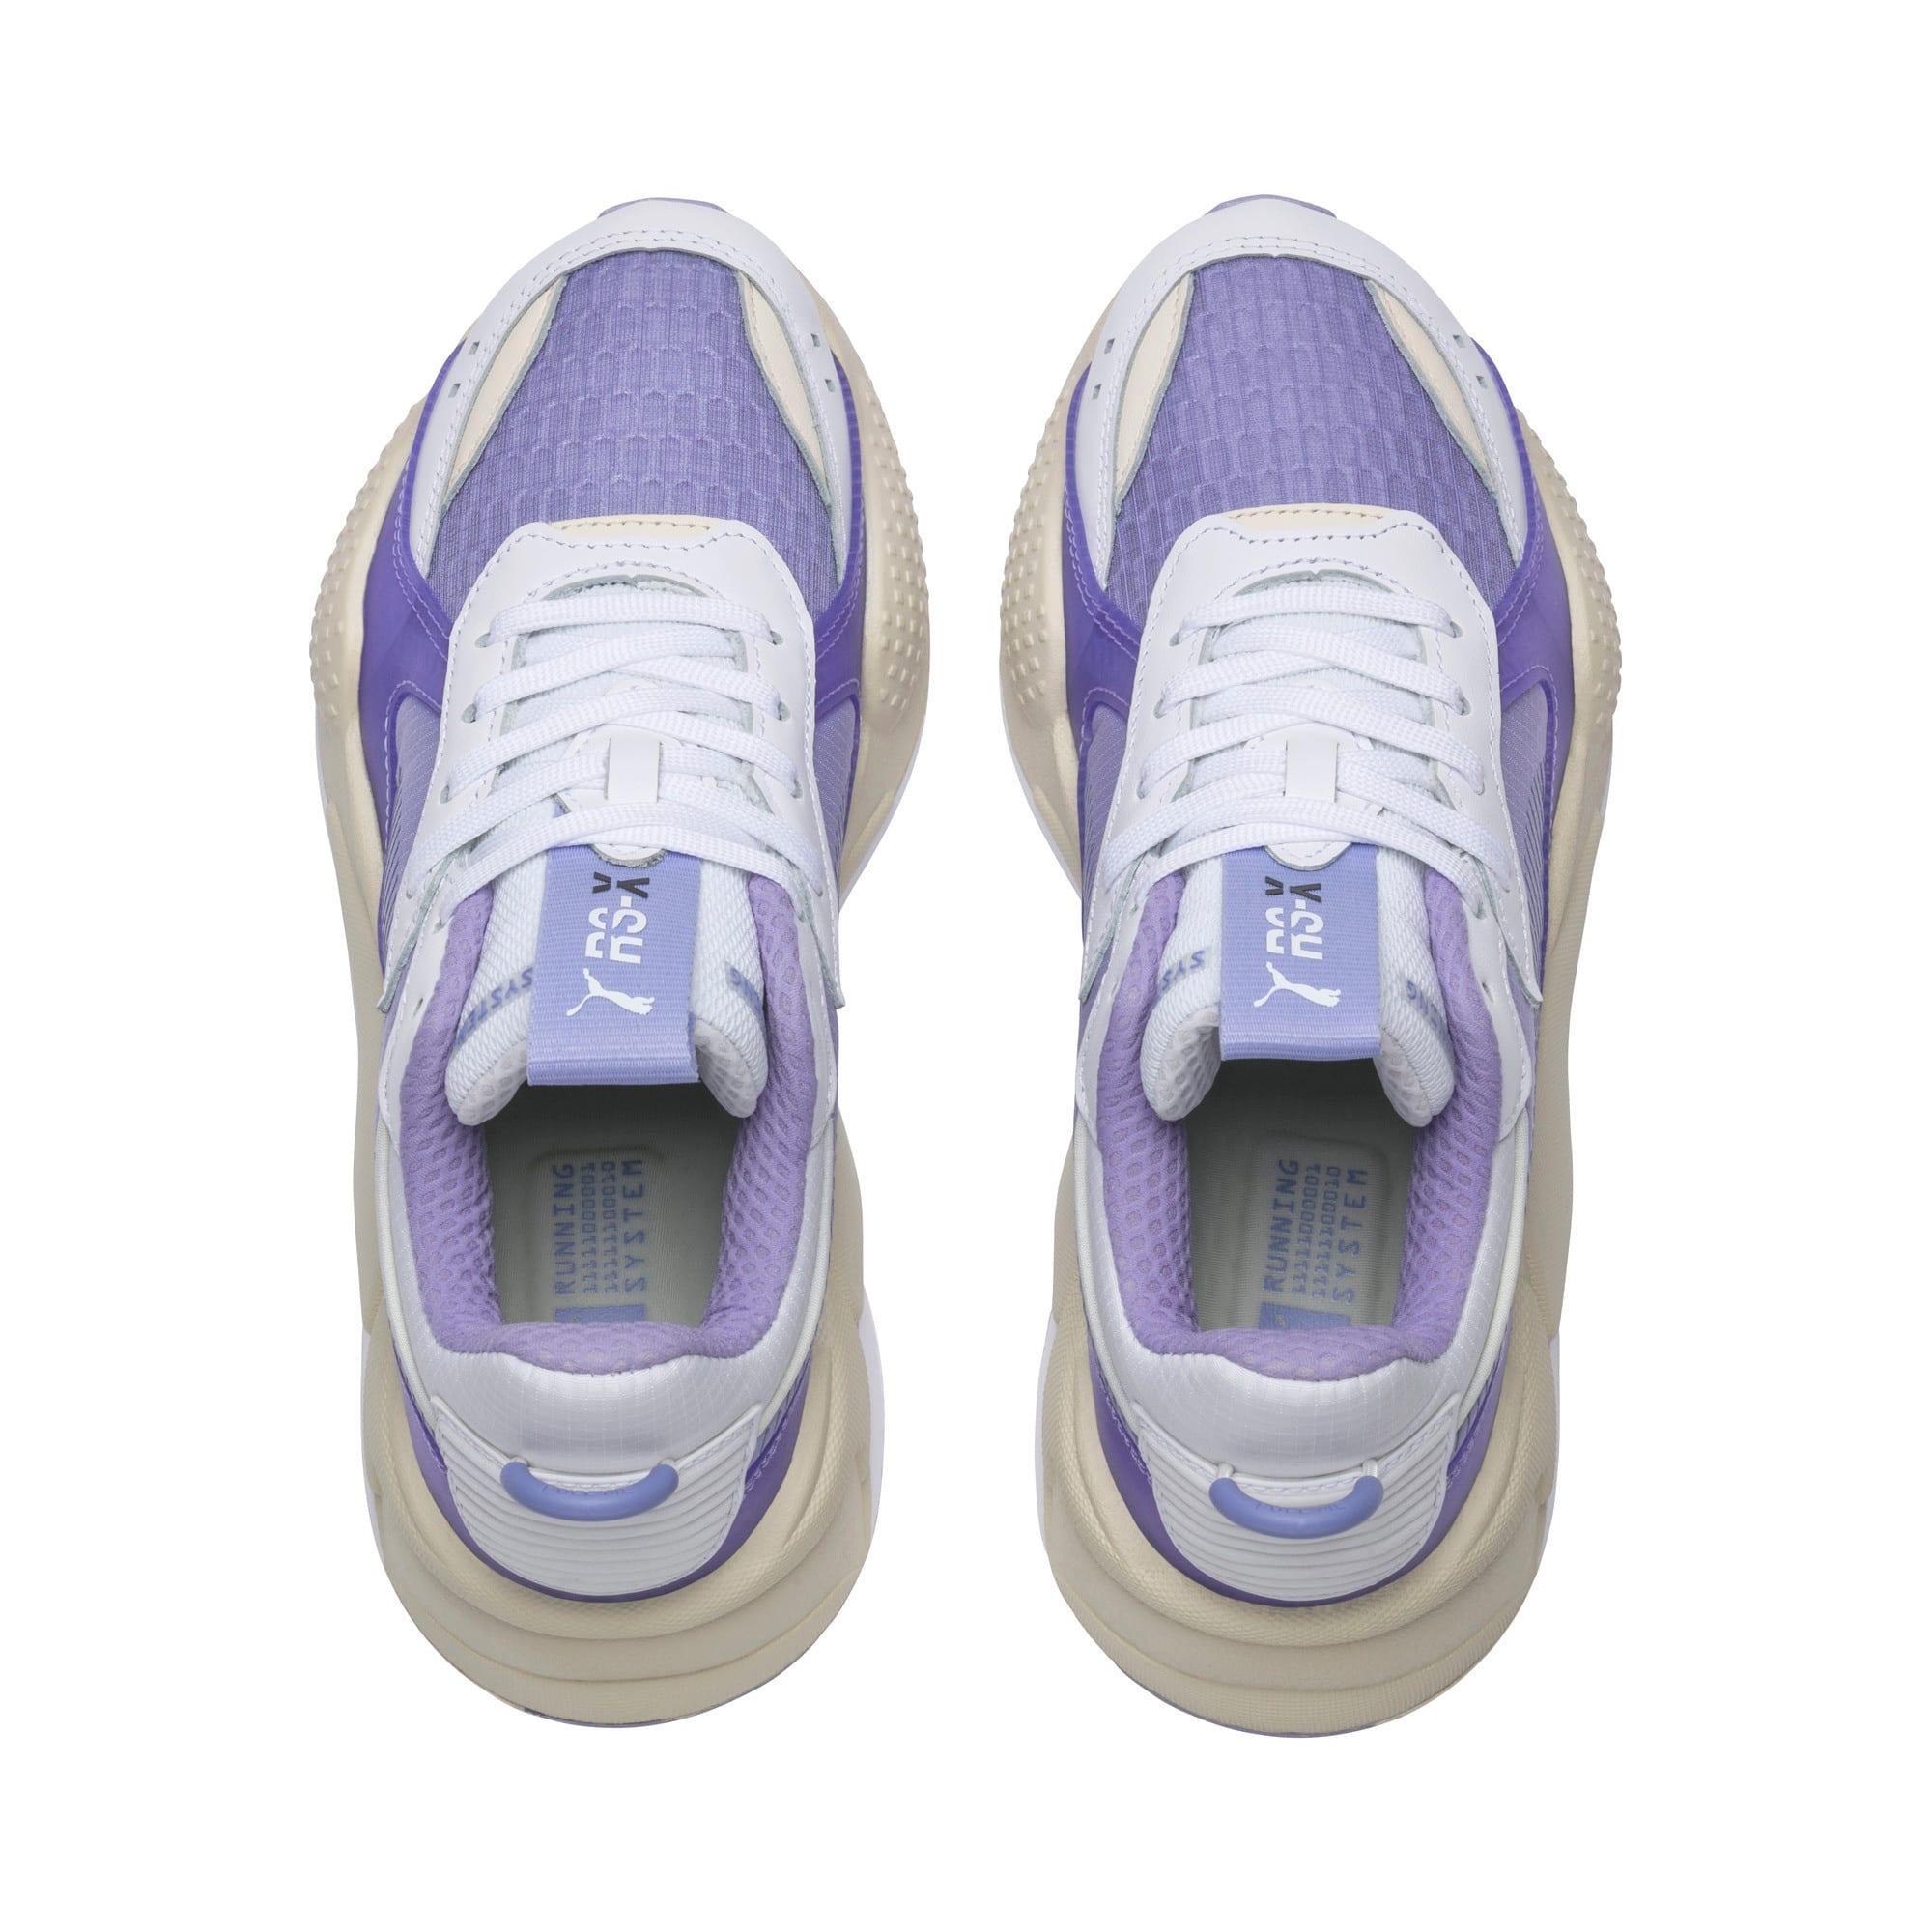 Thumbnail 6 of Basket RS-X Tech, Puma White-Sweet Lavender, medium